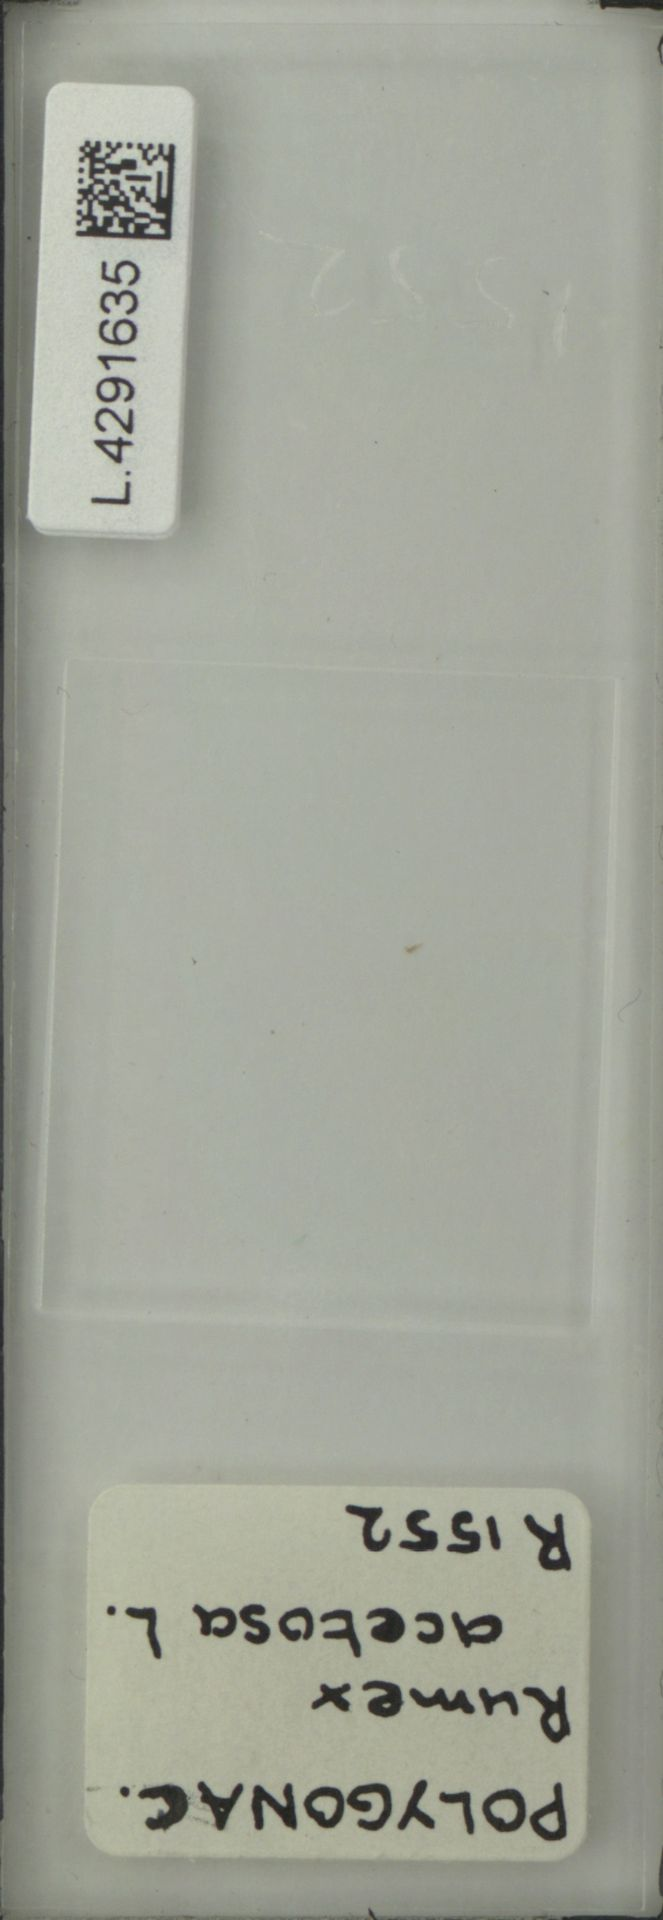 L.4291635 | Rumex acetosa L.